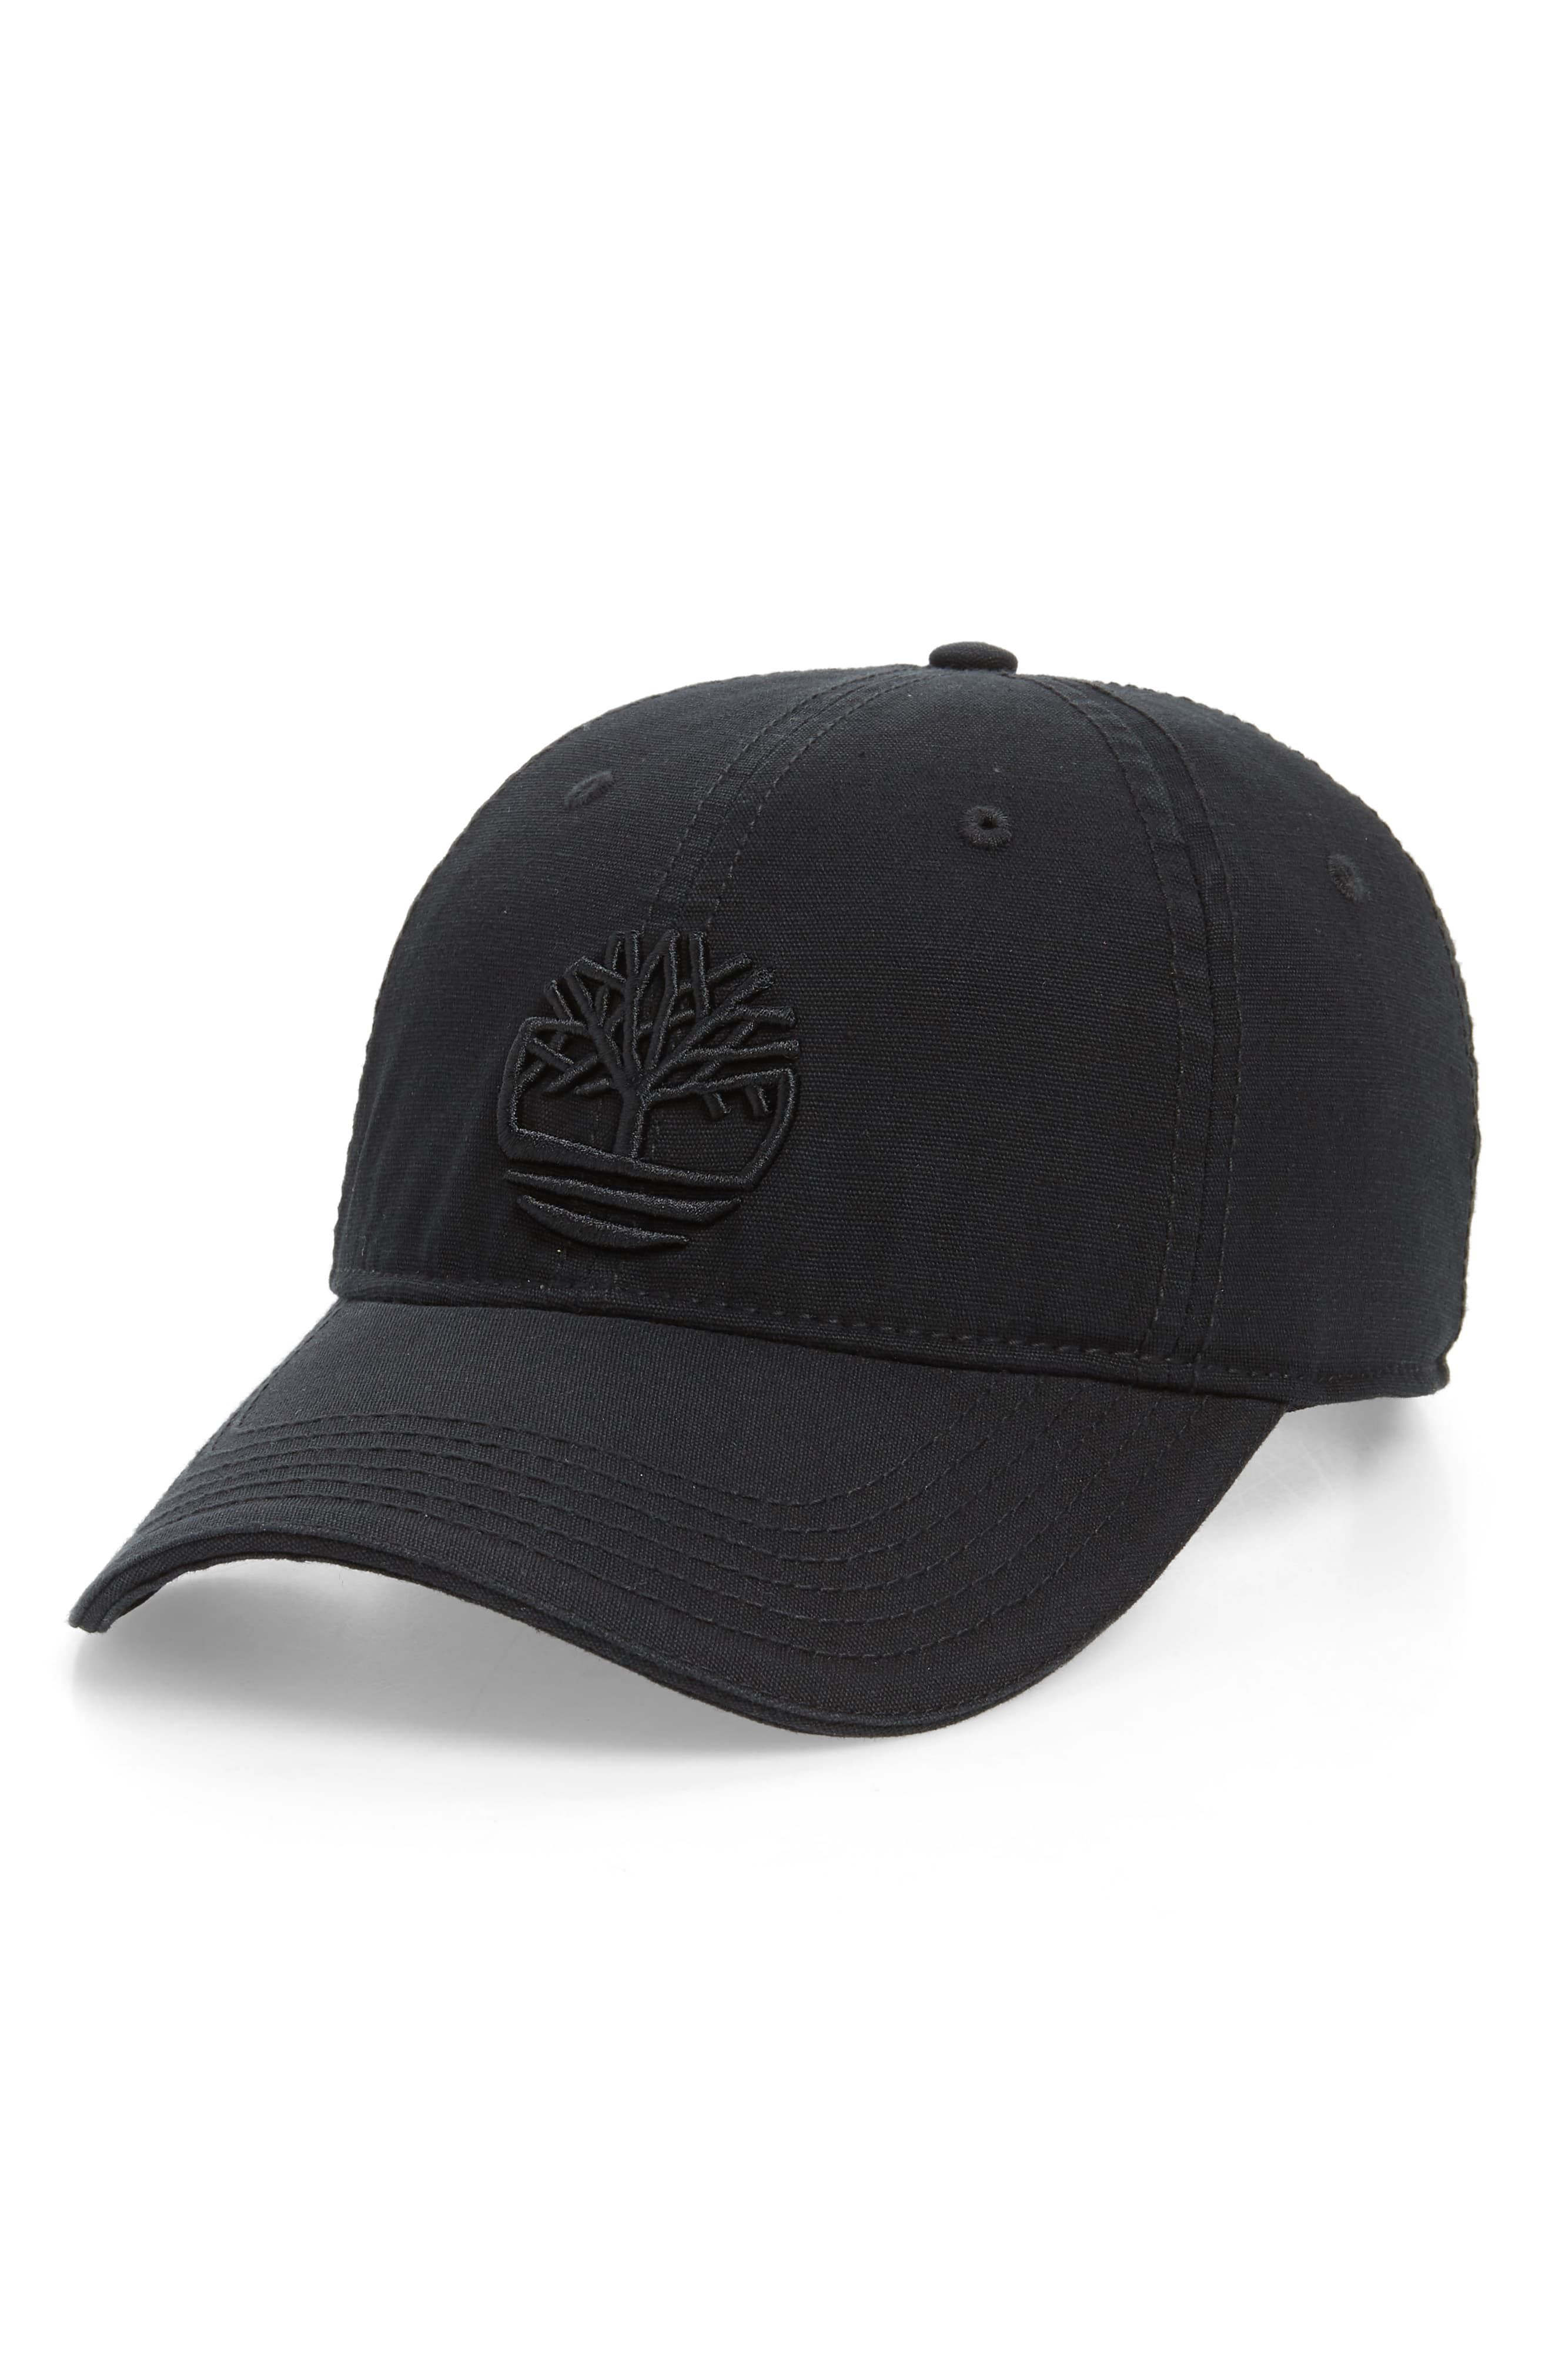 buy online 0d428 3b265 Men s Timberland Soundview Baseball Cap - Black